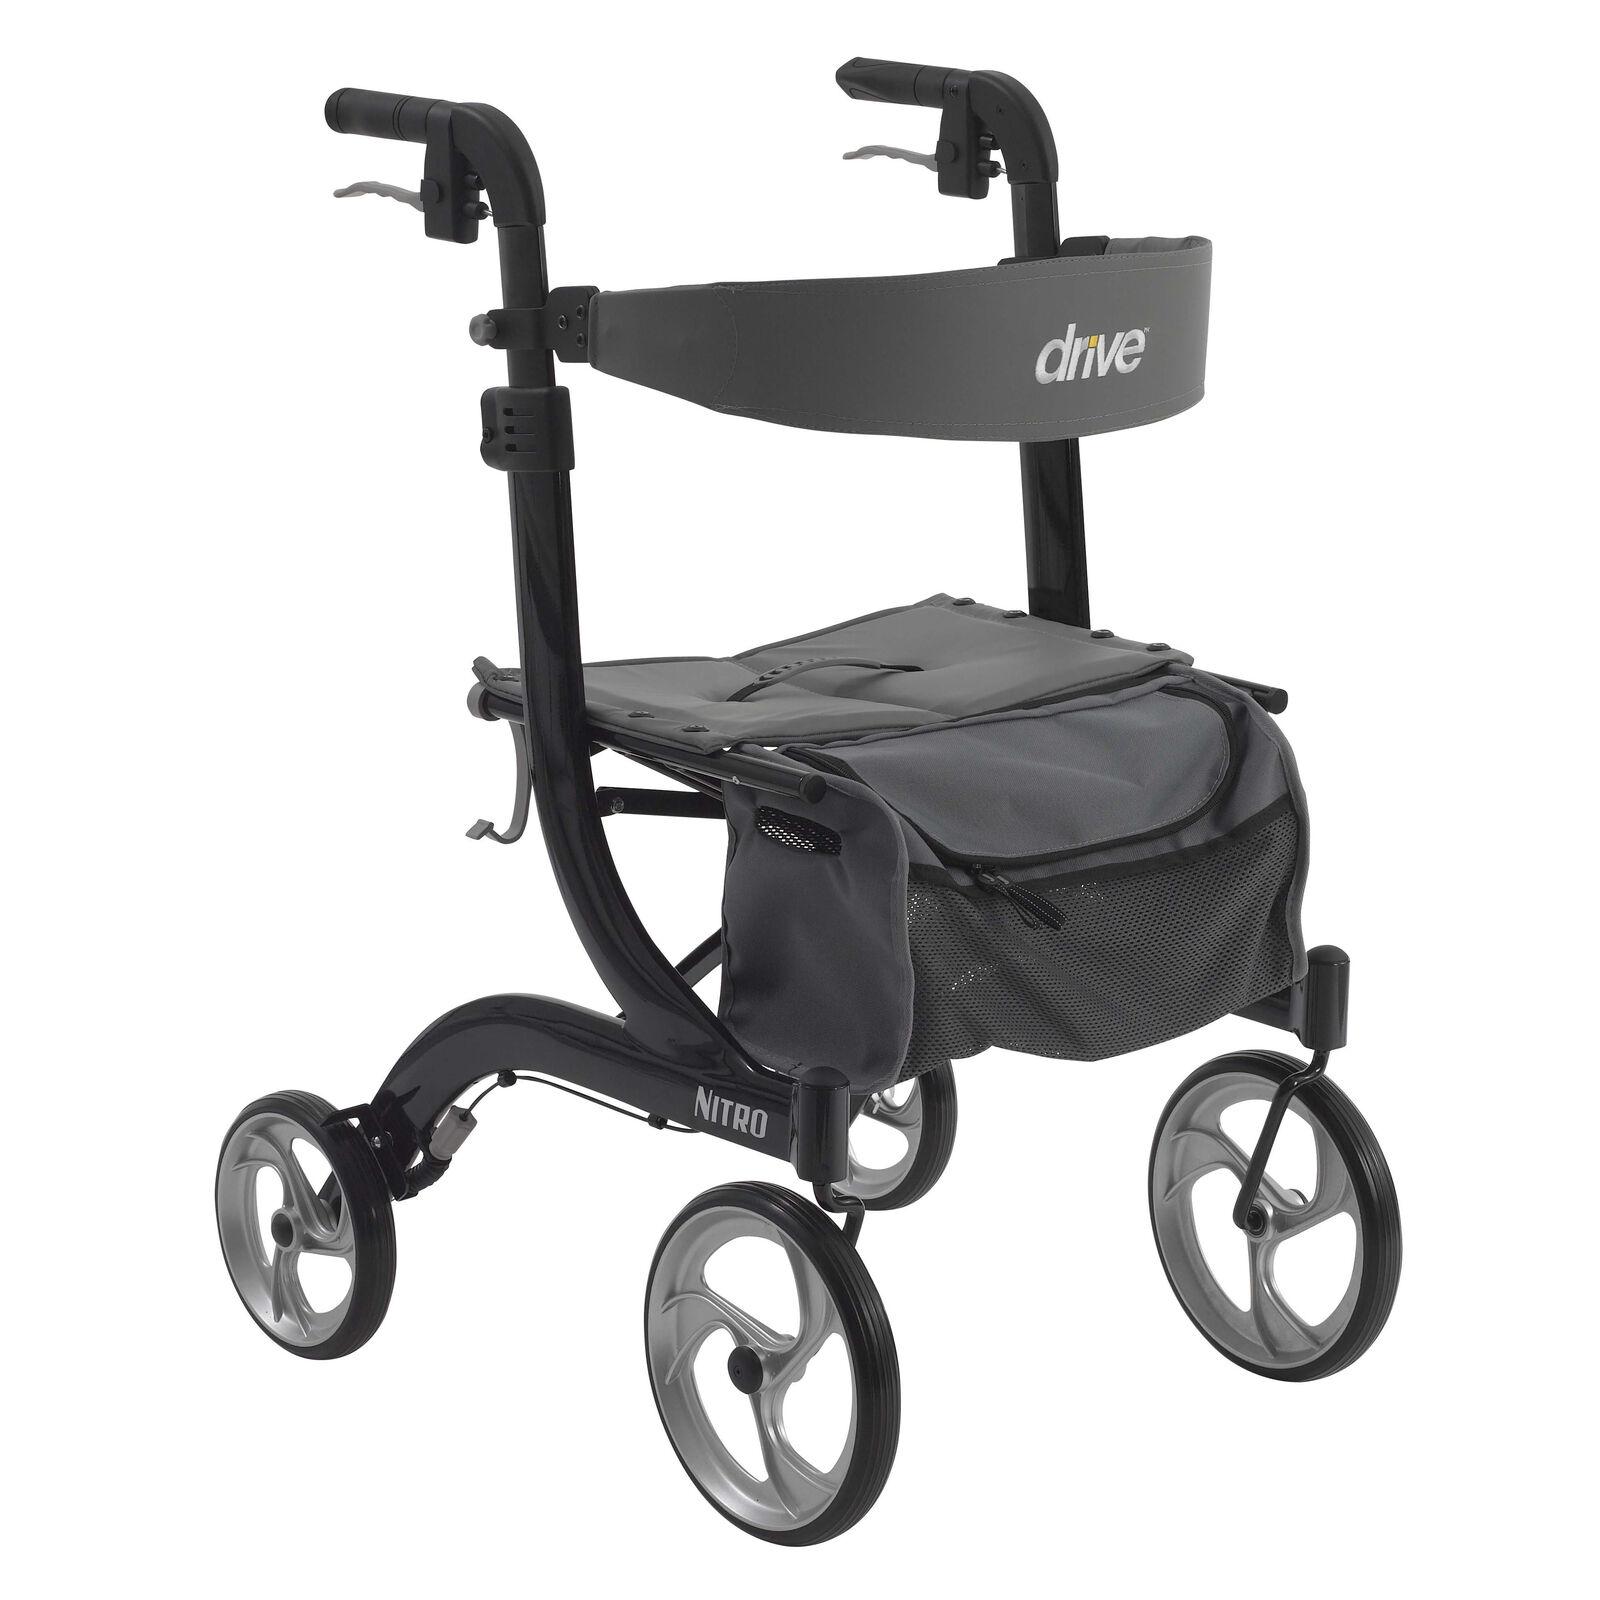 NEW-Drive Medical RTL10266BK NITRO Euro Style Rollator Walke